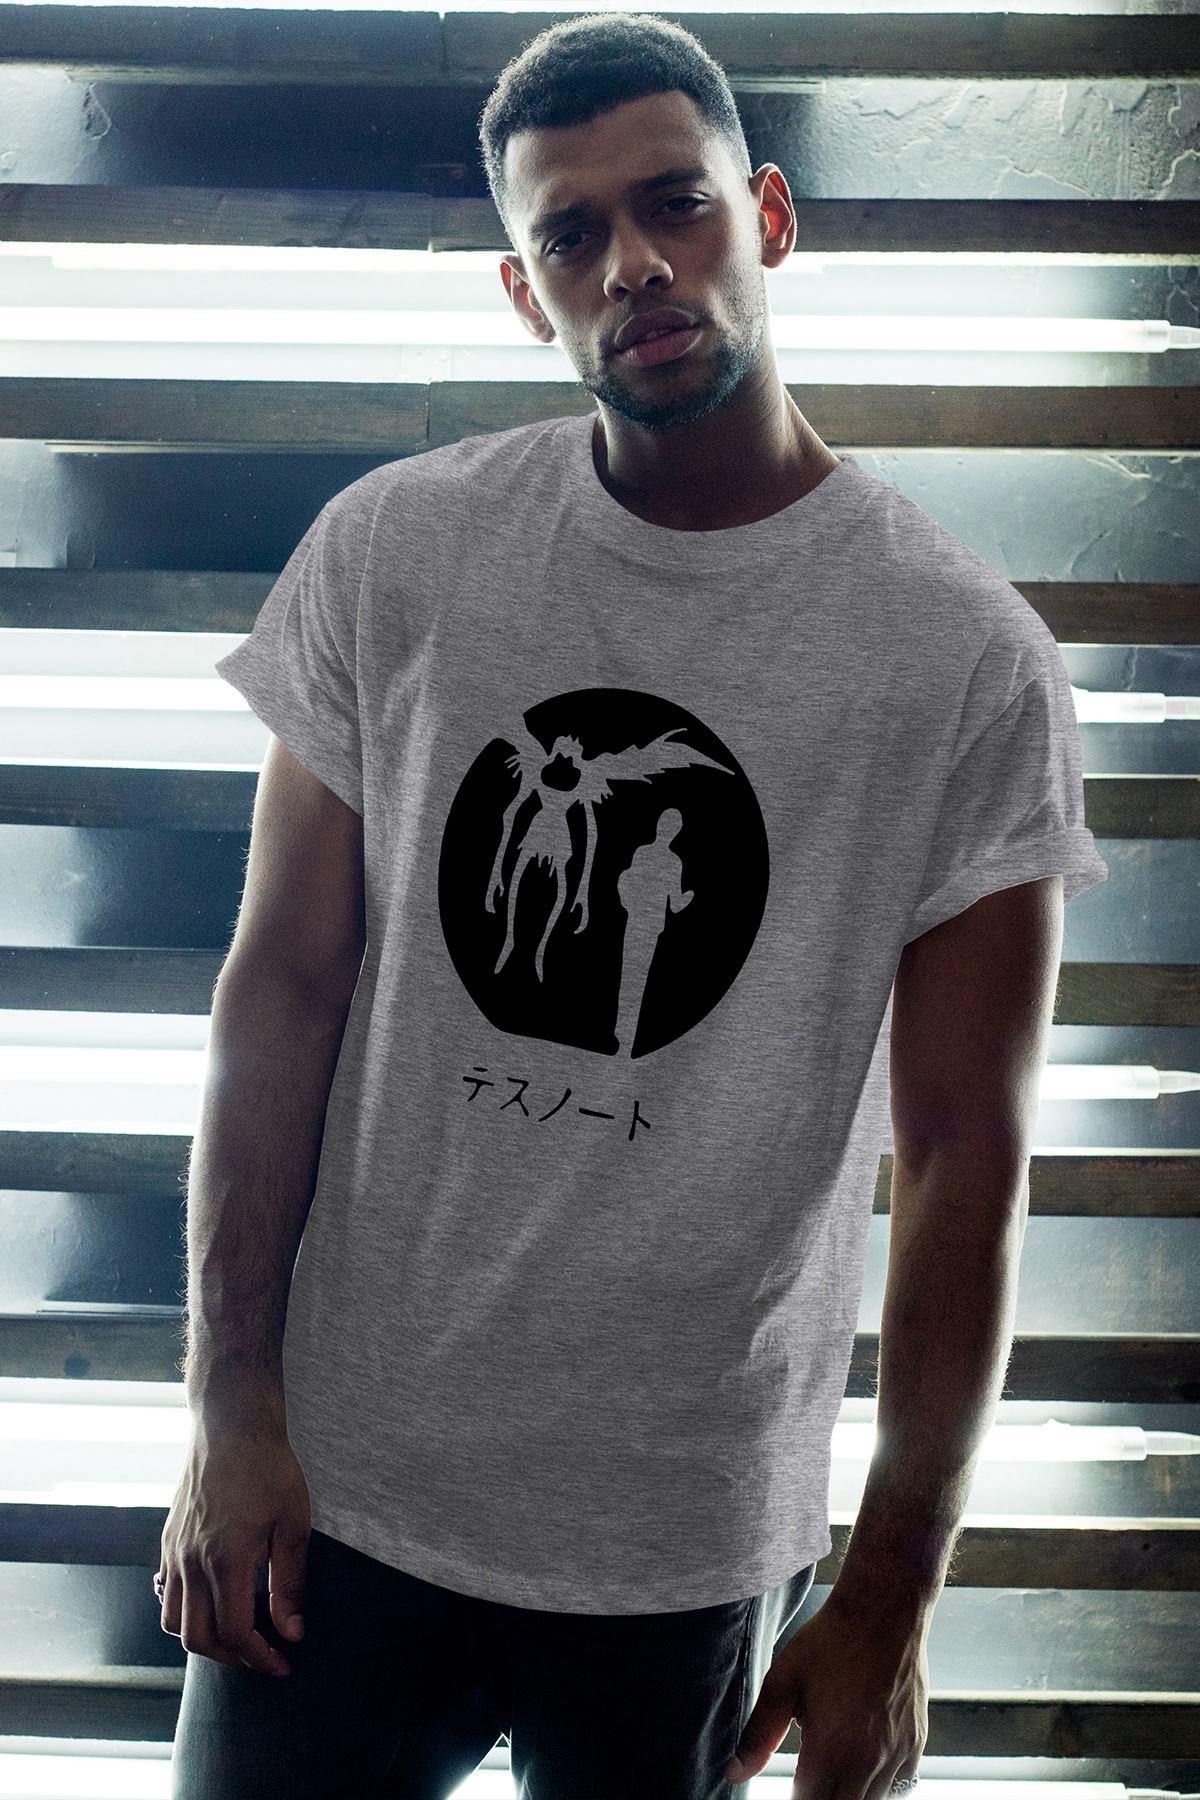 Anime Death Note 12 Gri Erkek Oversize Tshirt - Tişört